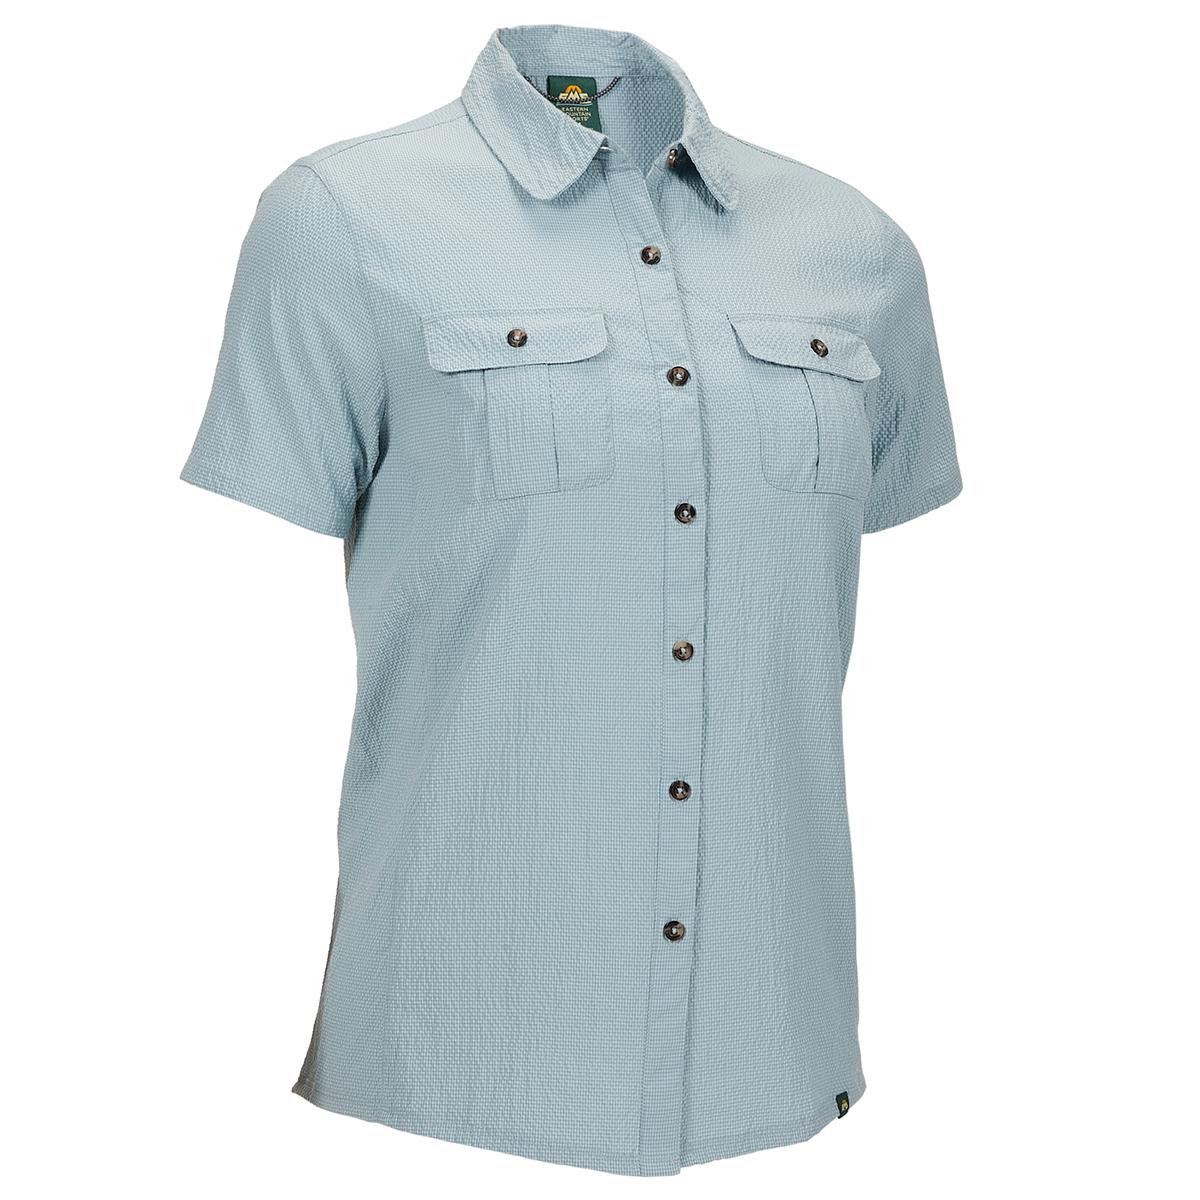 Ems Women's Bonus Miles Short-Sleeve Shirt - Blue, XS